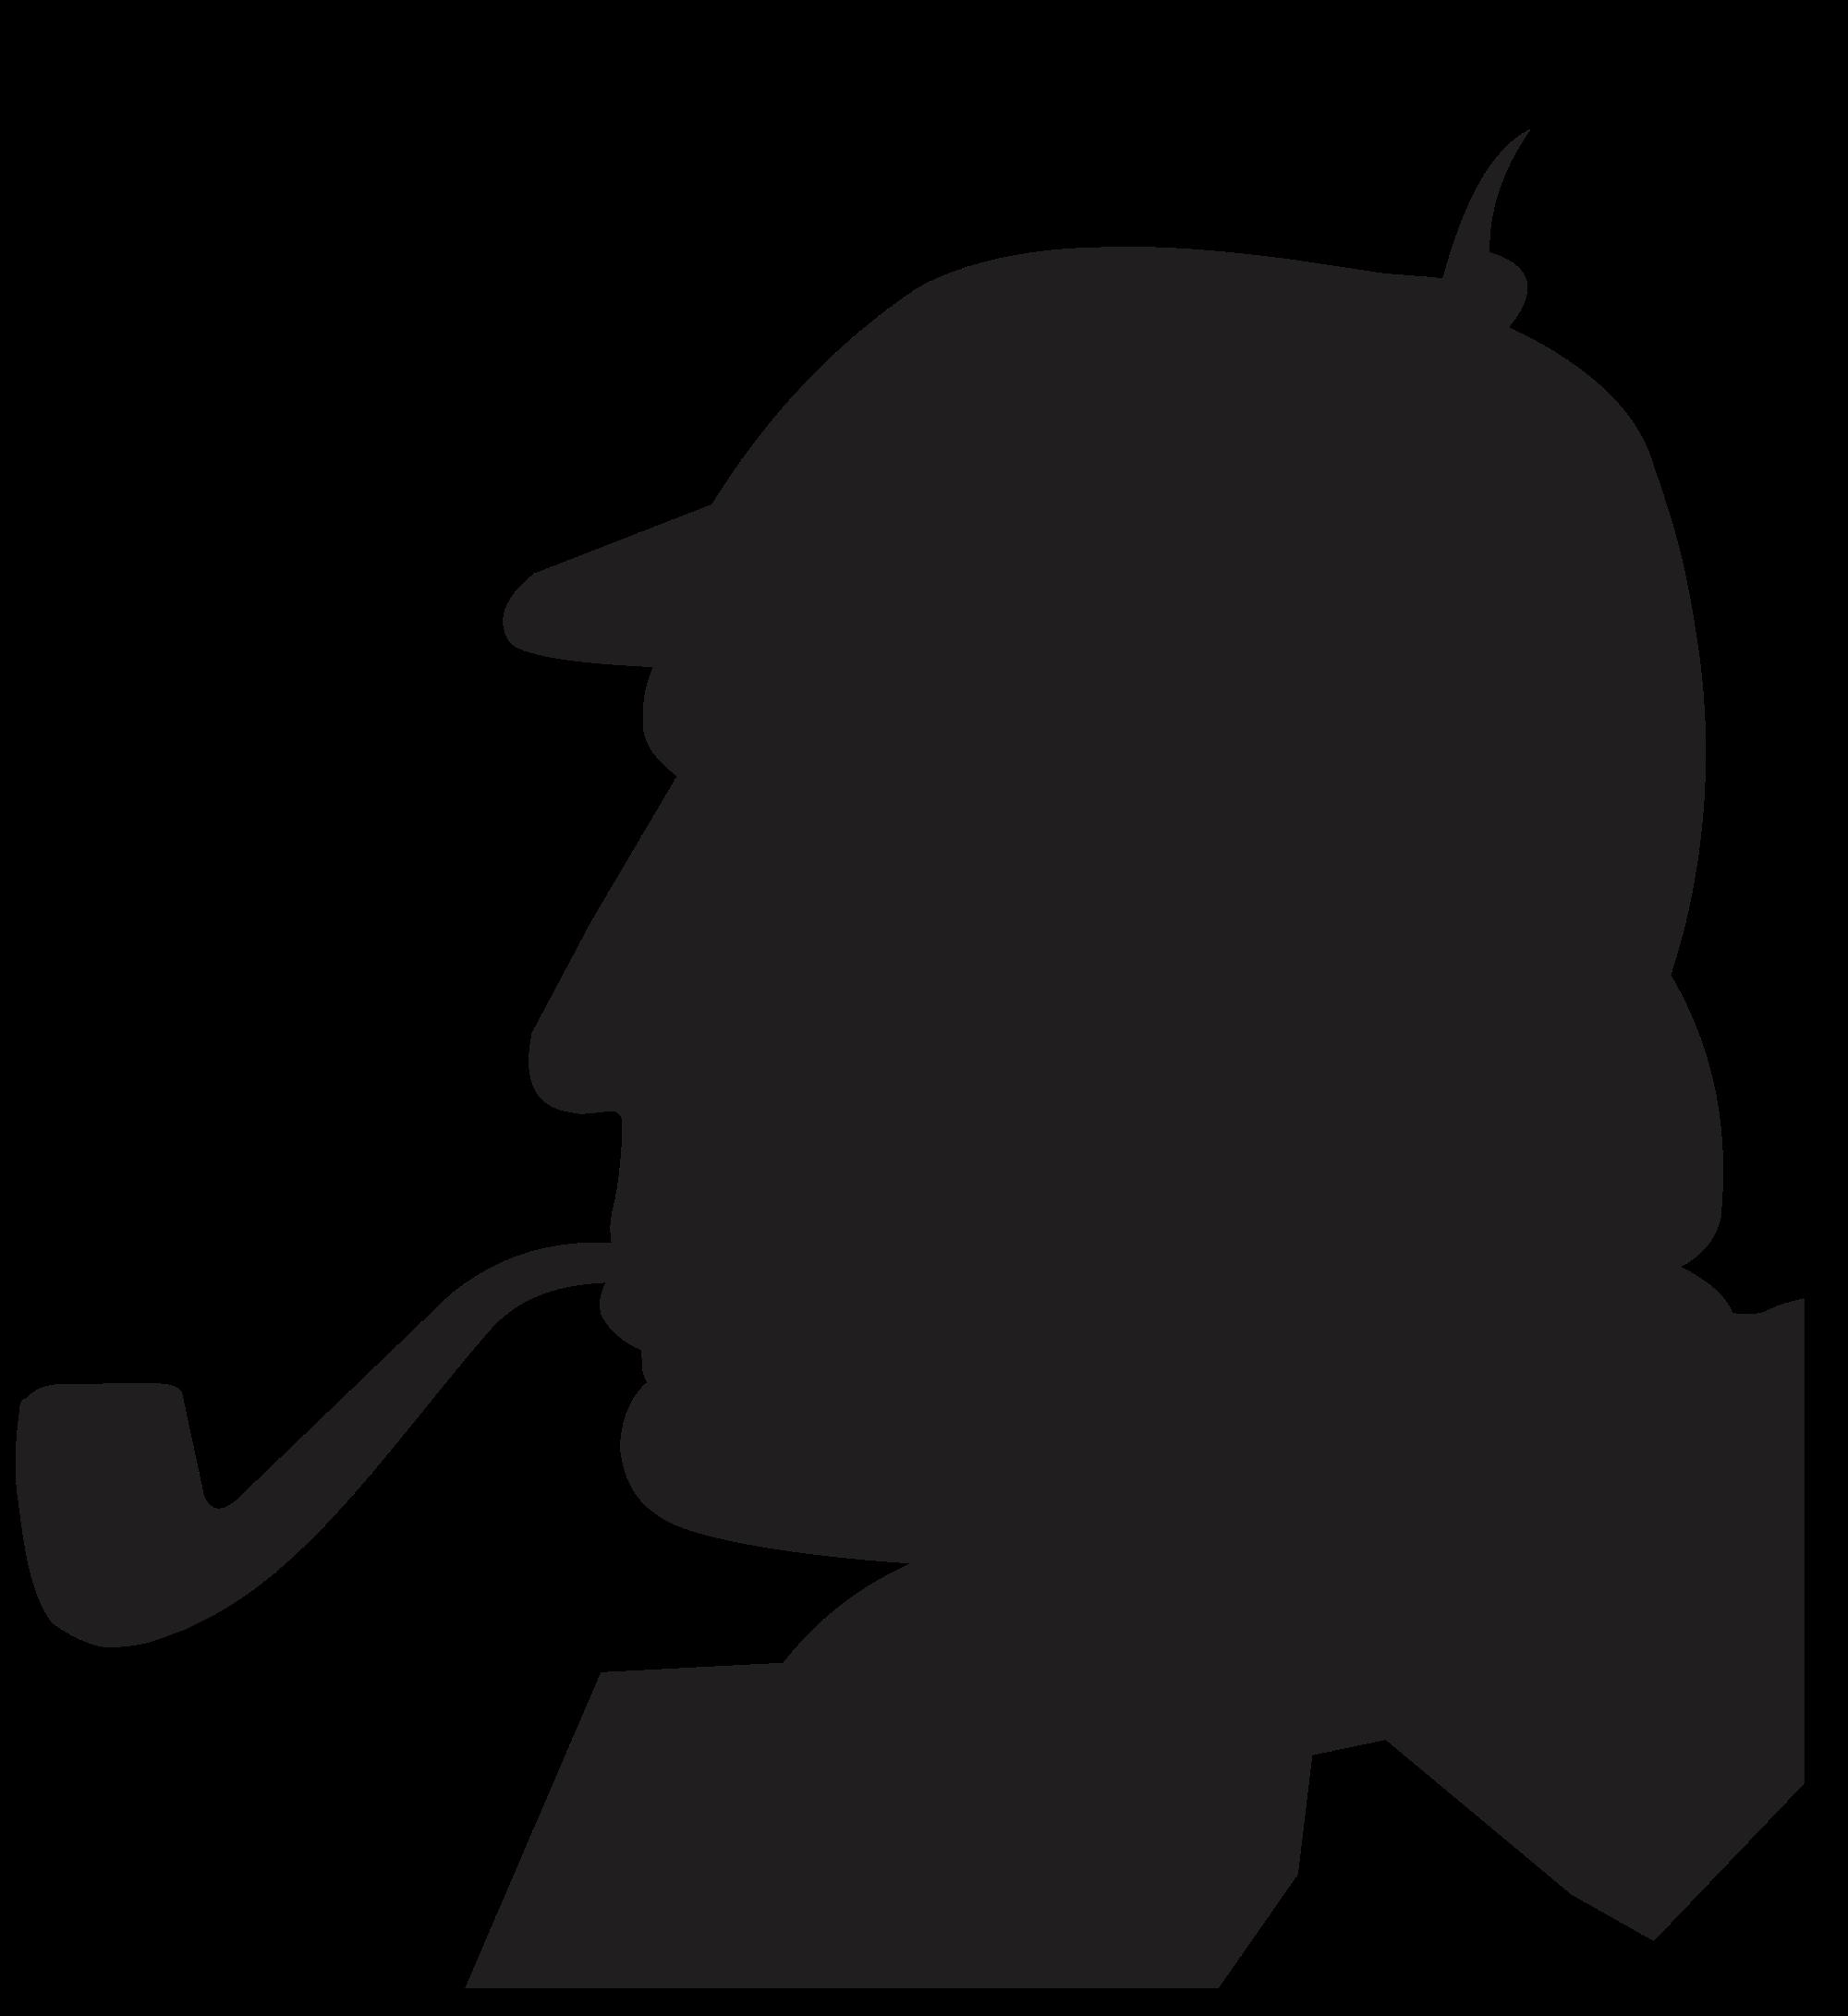 sherlock and silhouette clipart best sherlock holmes clipart free download sherlock holmes clip art free download